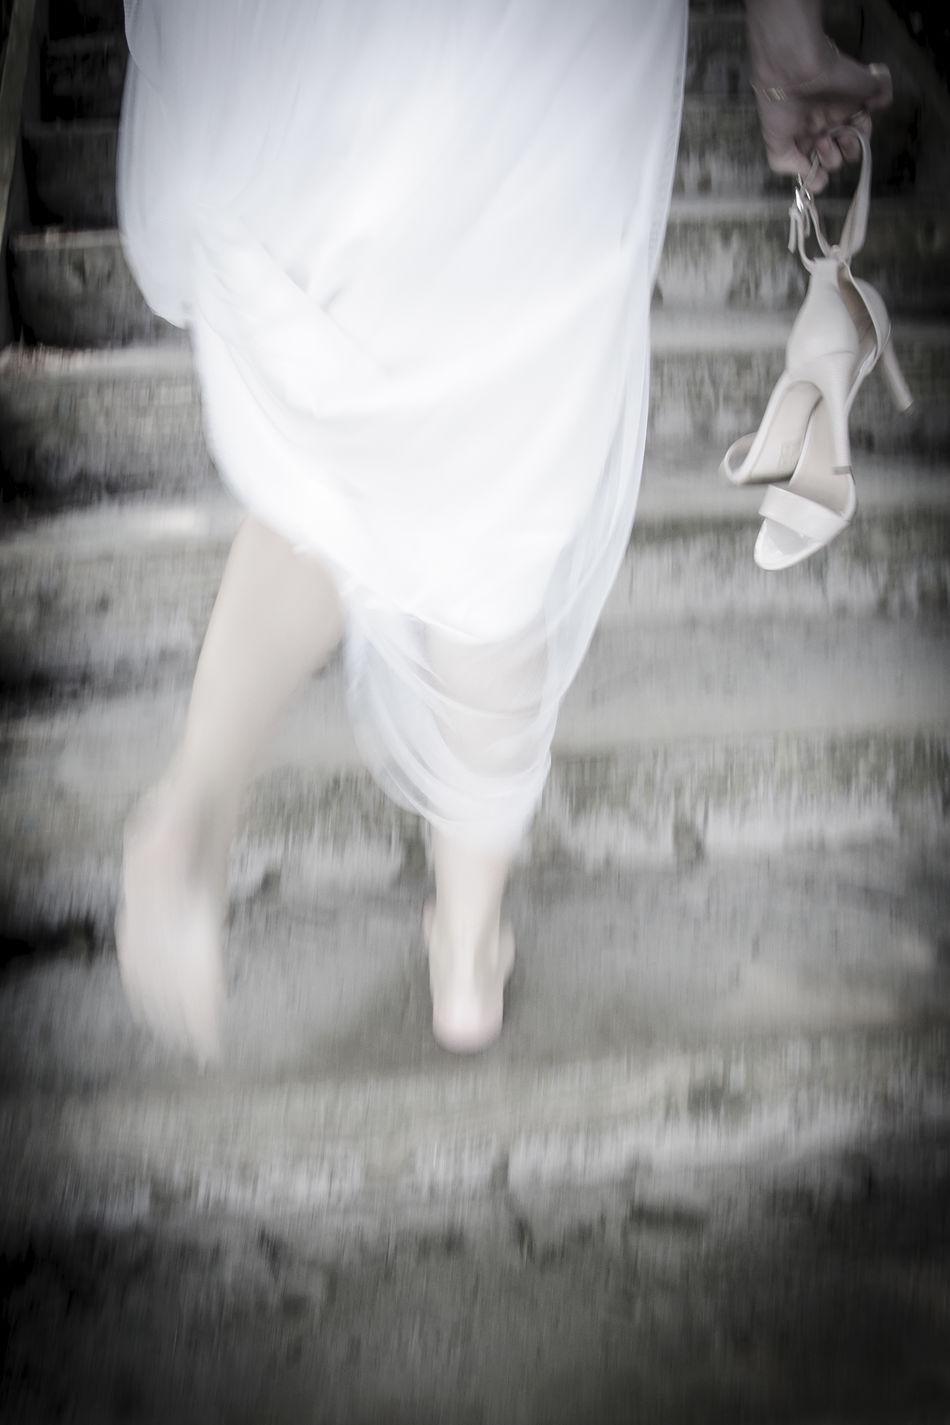 One Person White Color Barefoot People Shoe Wedding Dress Love Weddingday  Weddingshoot Wedding Photography Wedding Nature Running Bride Bride Bride Running Shoes Bride Shoes